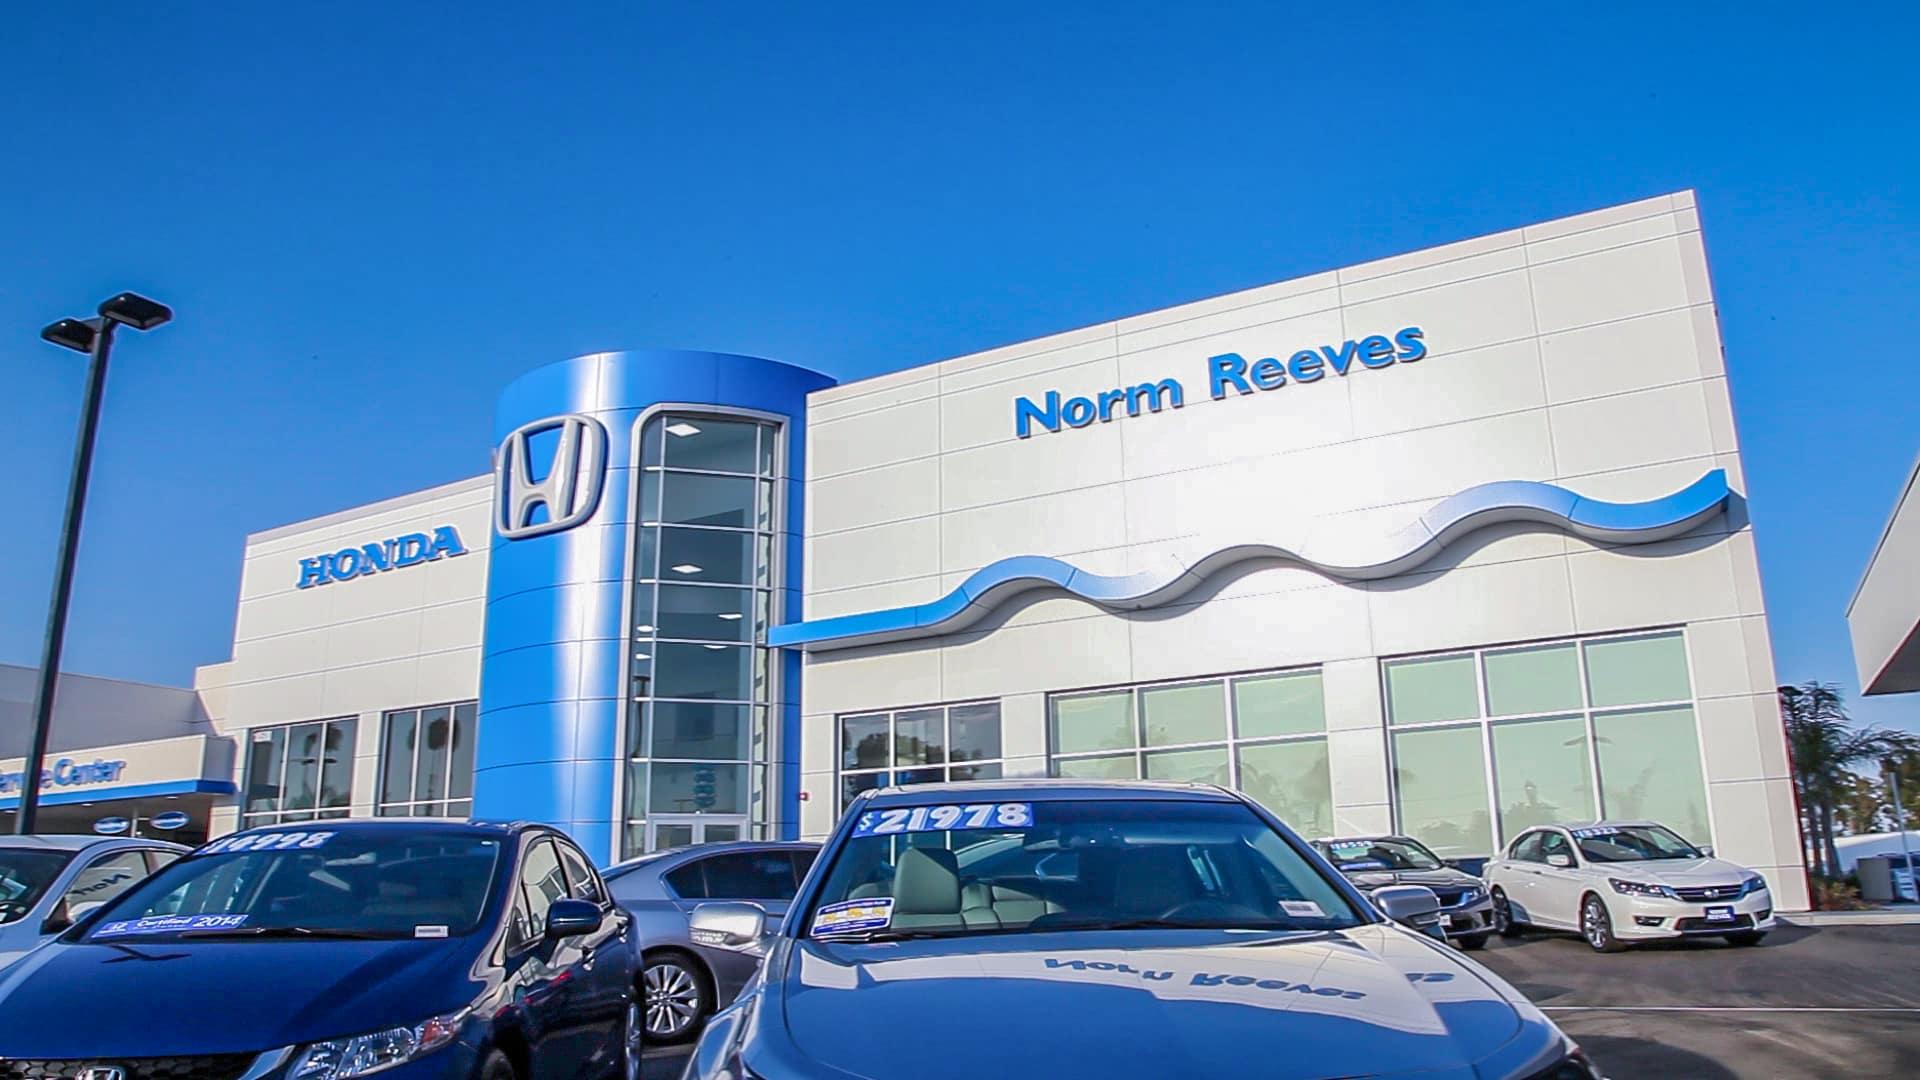 Norm Reeves Honda Superstore Cerritos, CA